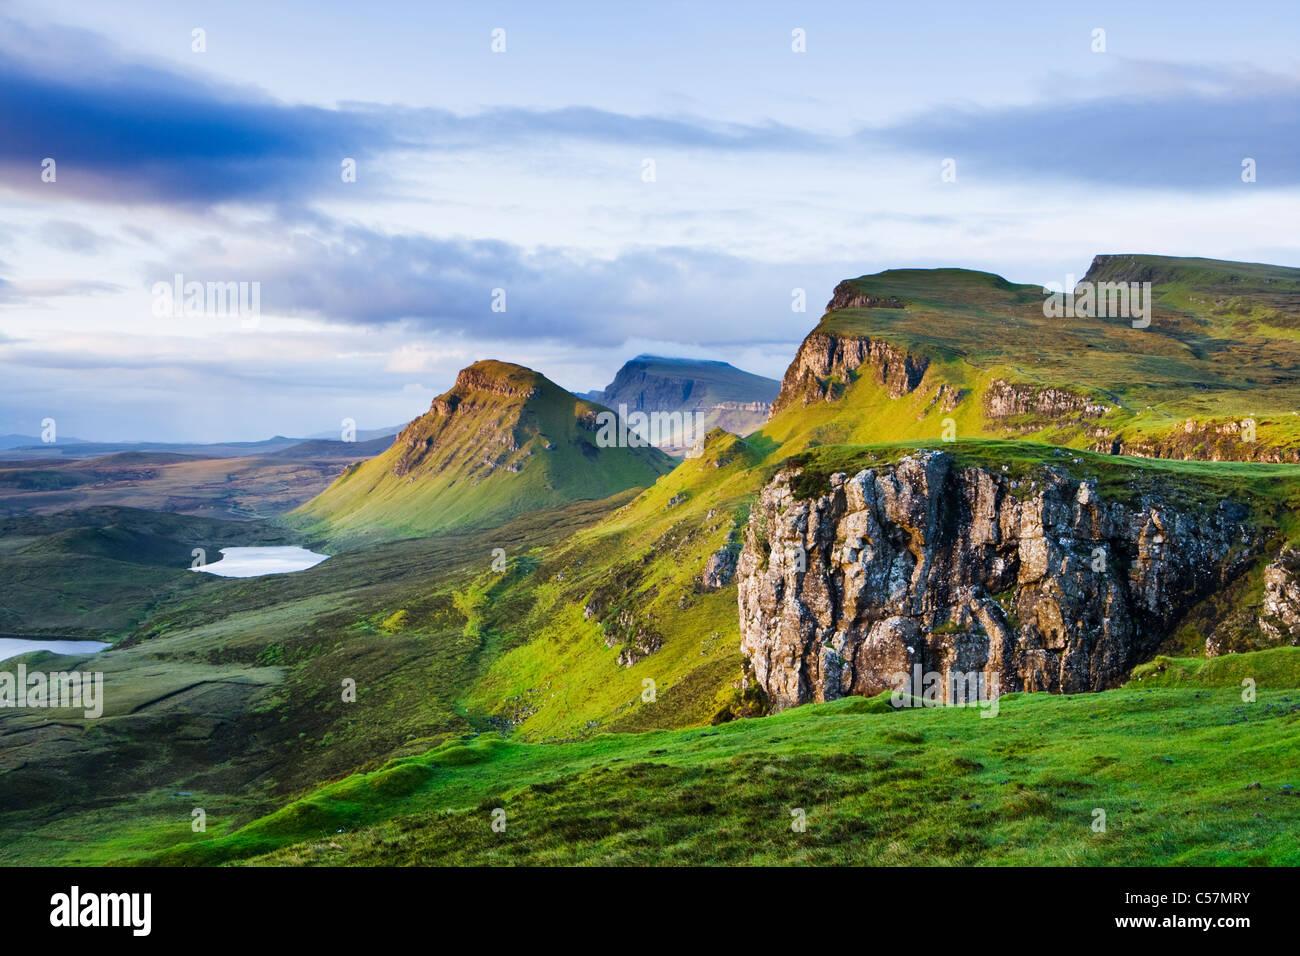 Le Quiraing, Isle of Skye, Scotland, UK. Photo Stock